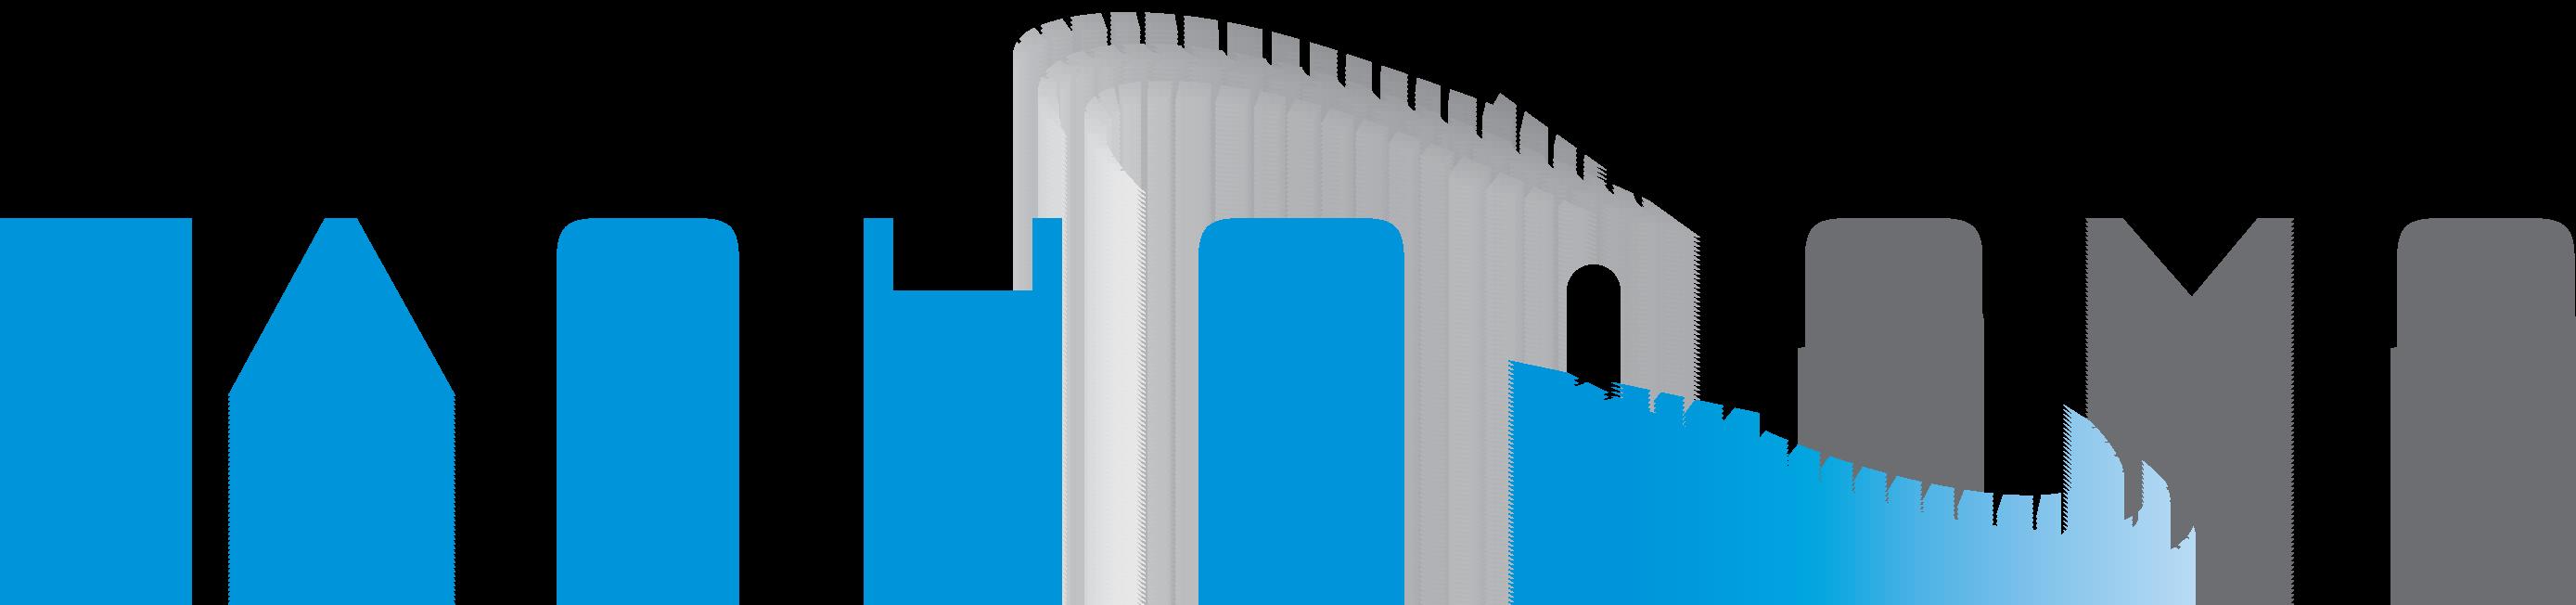 tachosys_logo